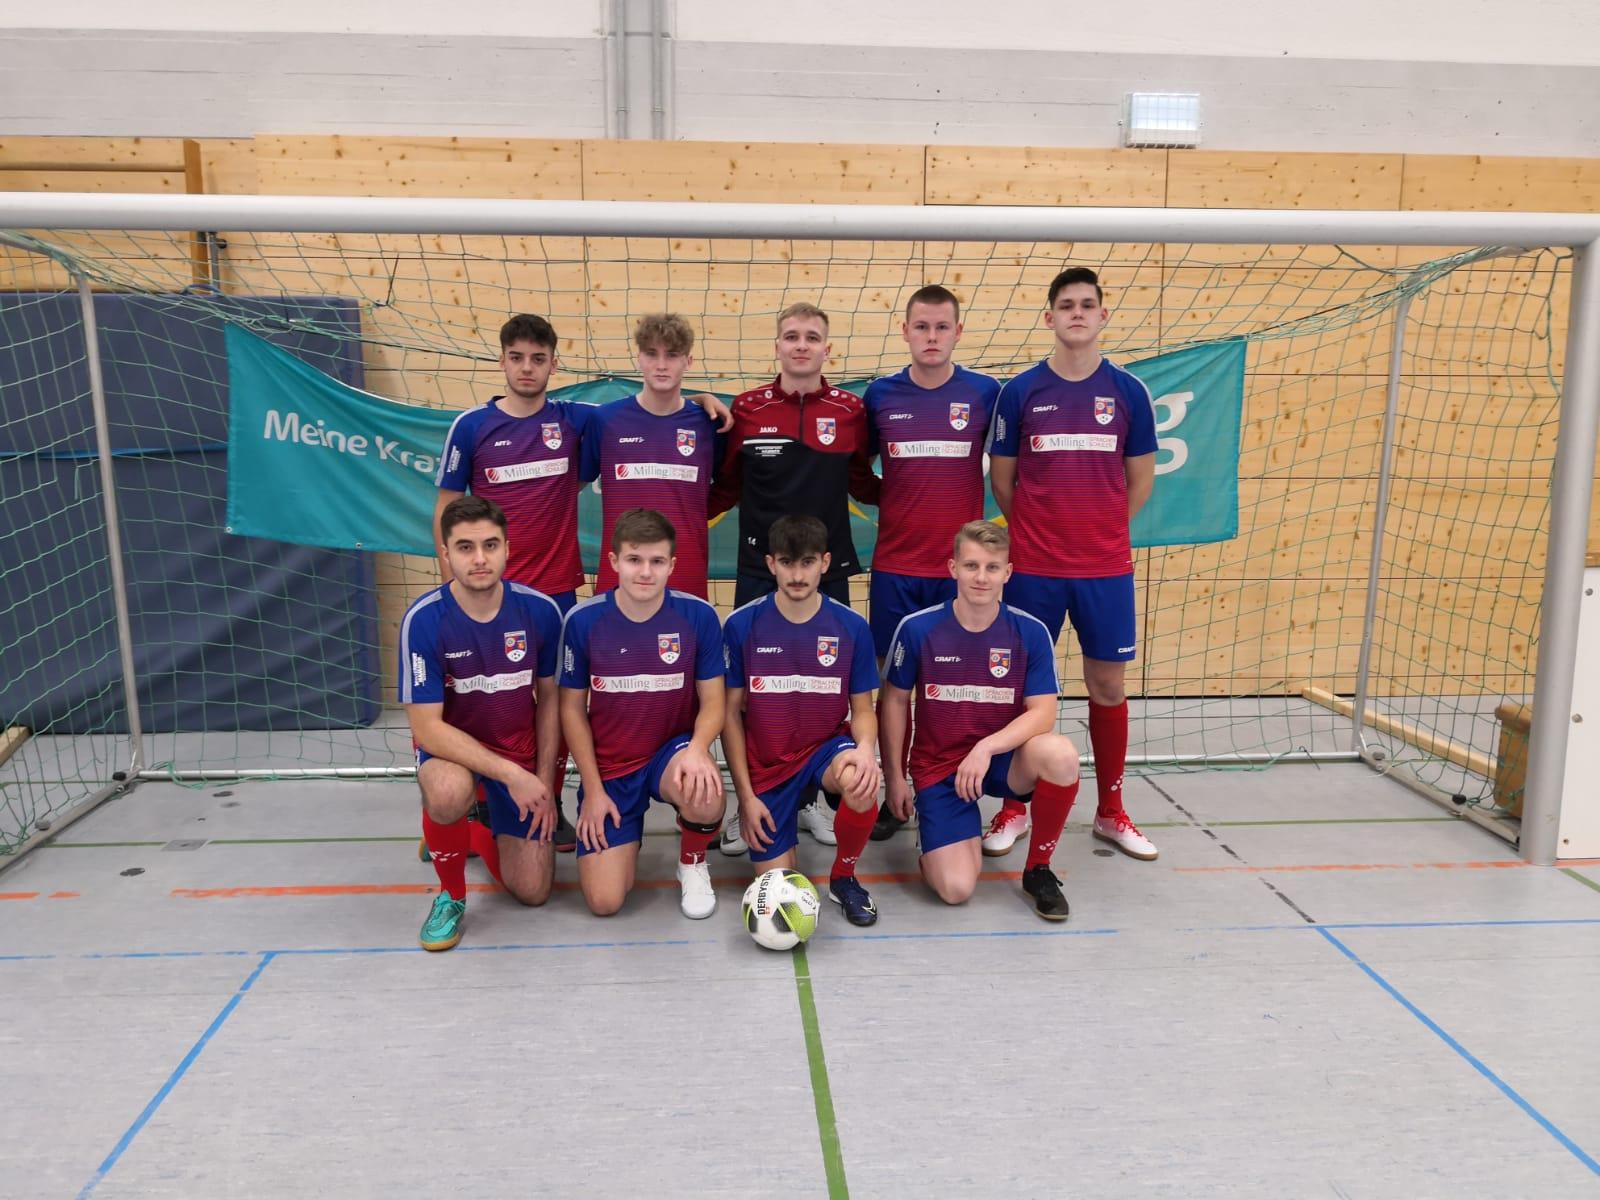 A-Junioren JSG Altenkirchen - Süwag Hallencup 2020